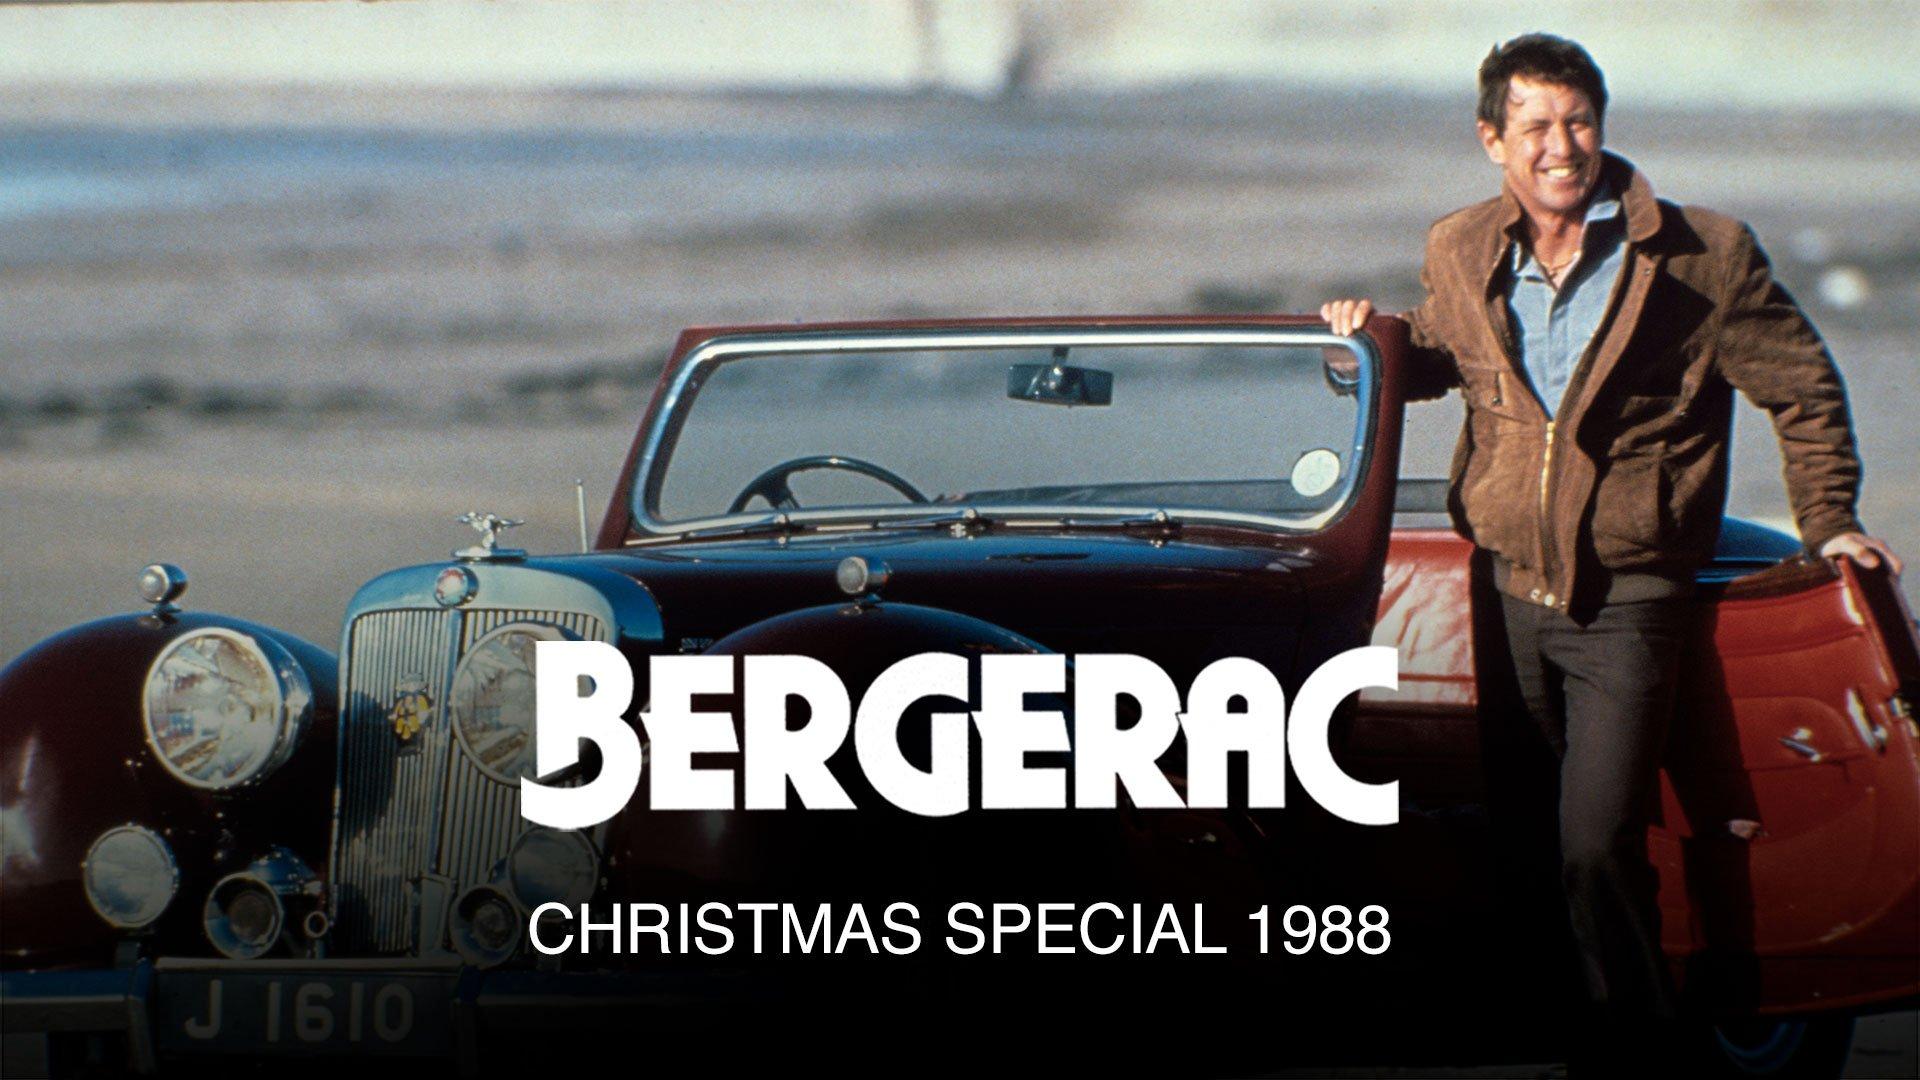 Bergerac Christmas Special 1988: Retirement Plan on BritBox UK